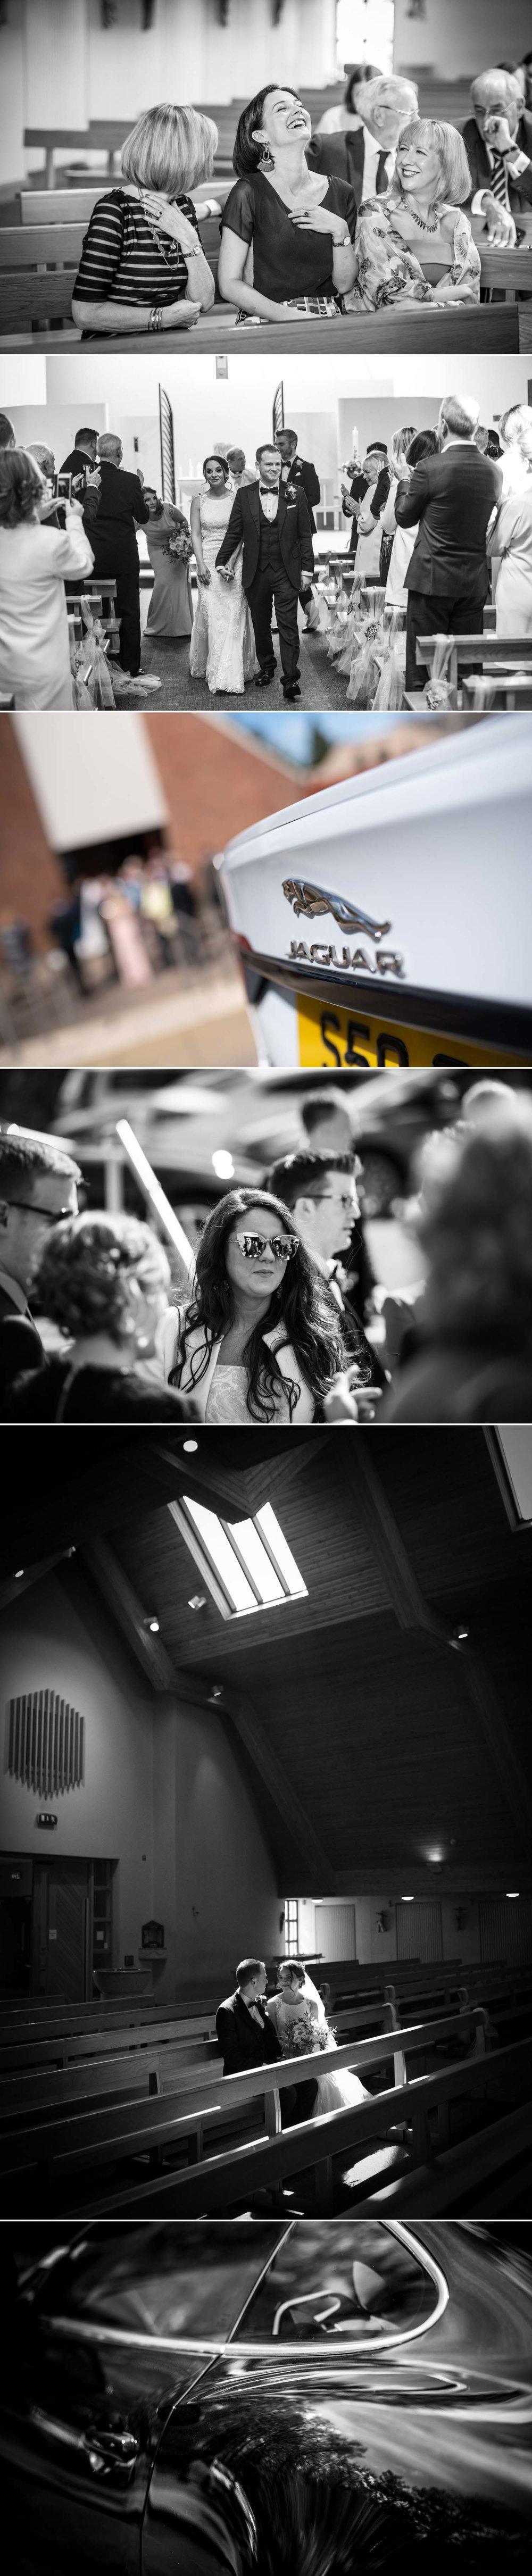 Merchant Hotel Belfast Wedding Photography James McGrillis 11.jpg